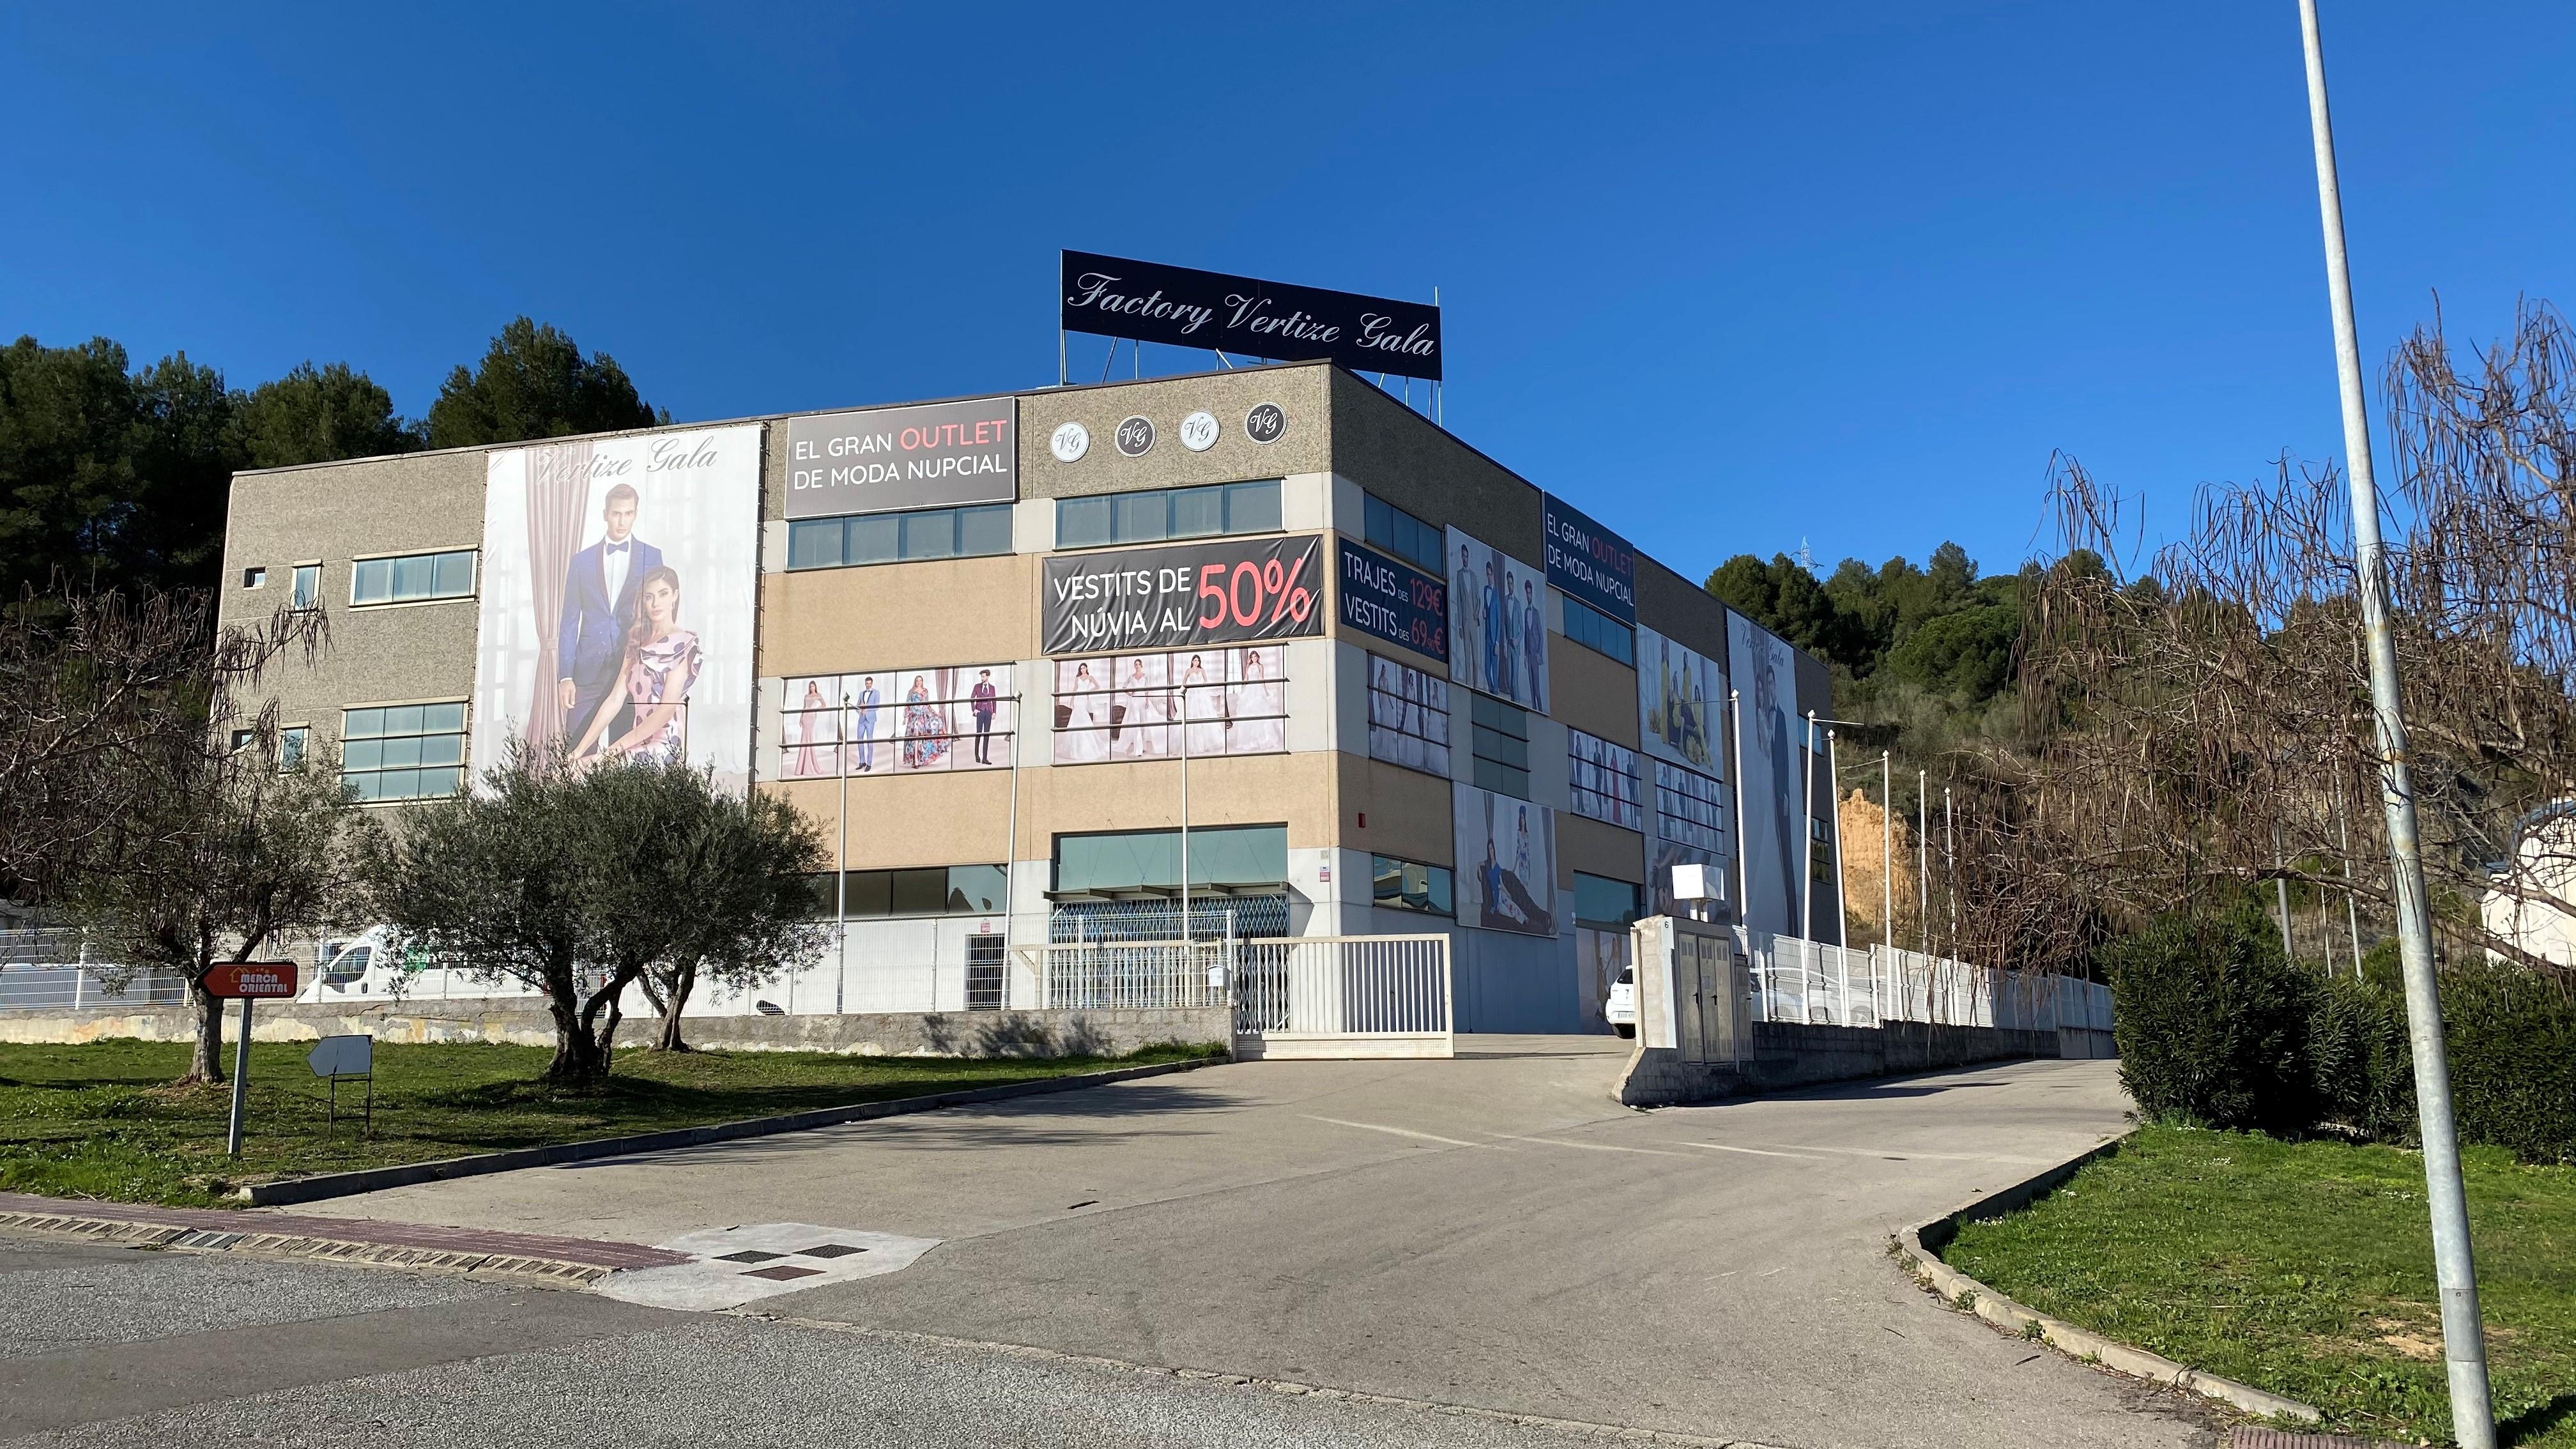 Factory Vertize Gala Martorell